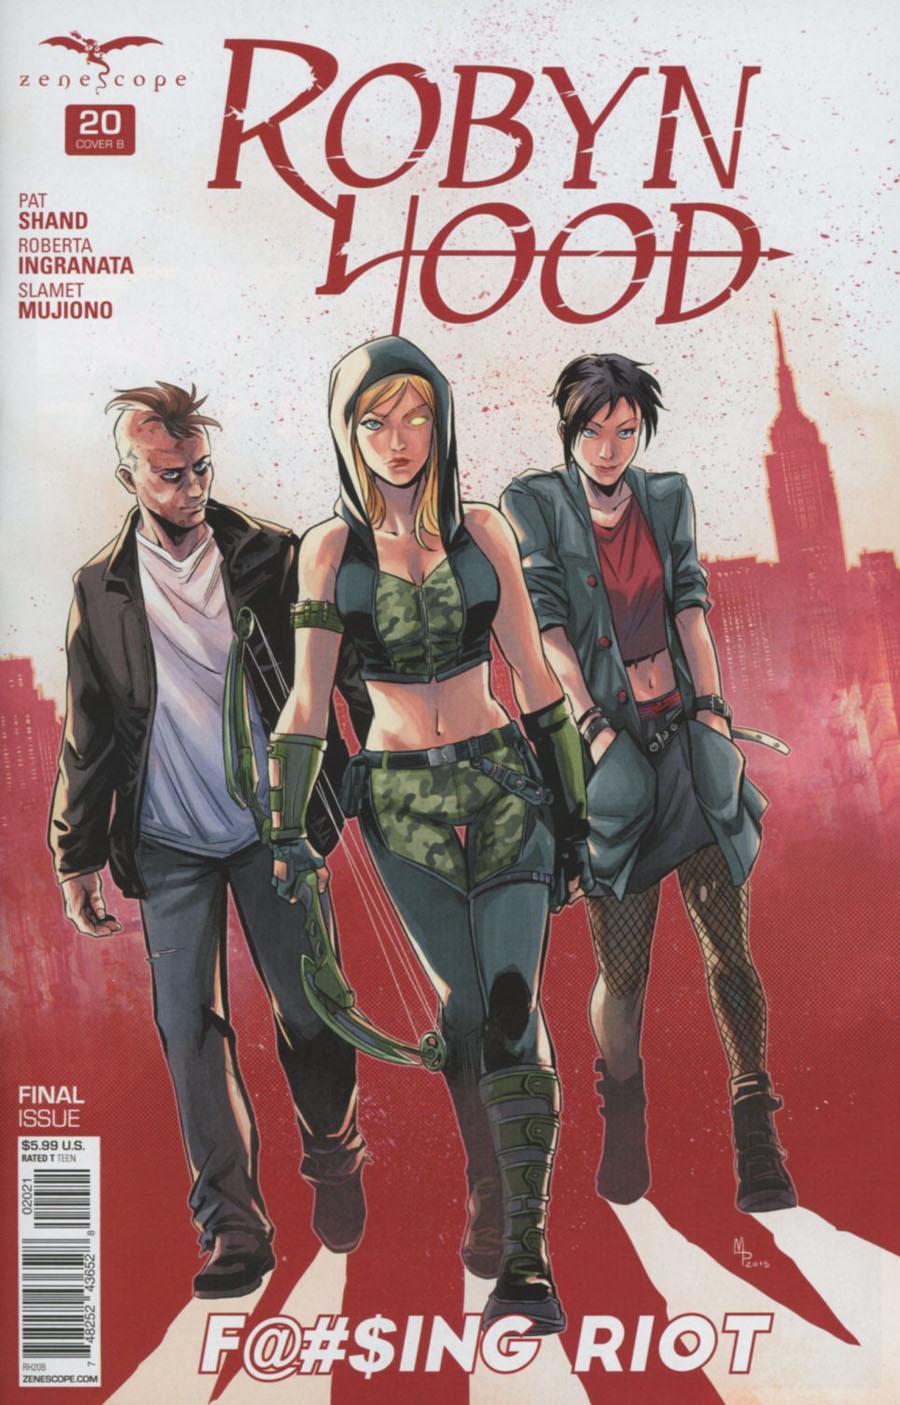 Grimm Fairy Tales Presents Robyn Hood Vol 2 #20 Cover B Manuel Preitano